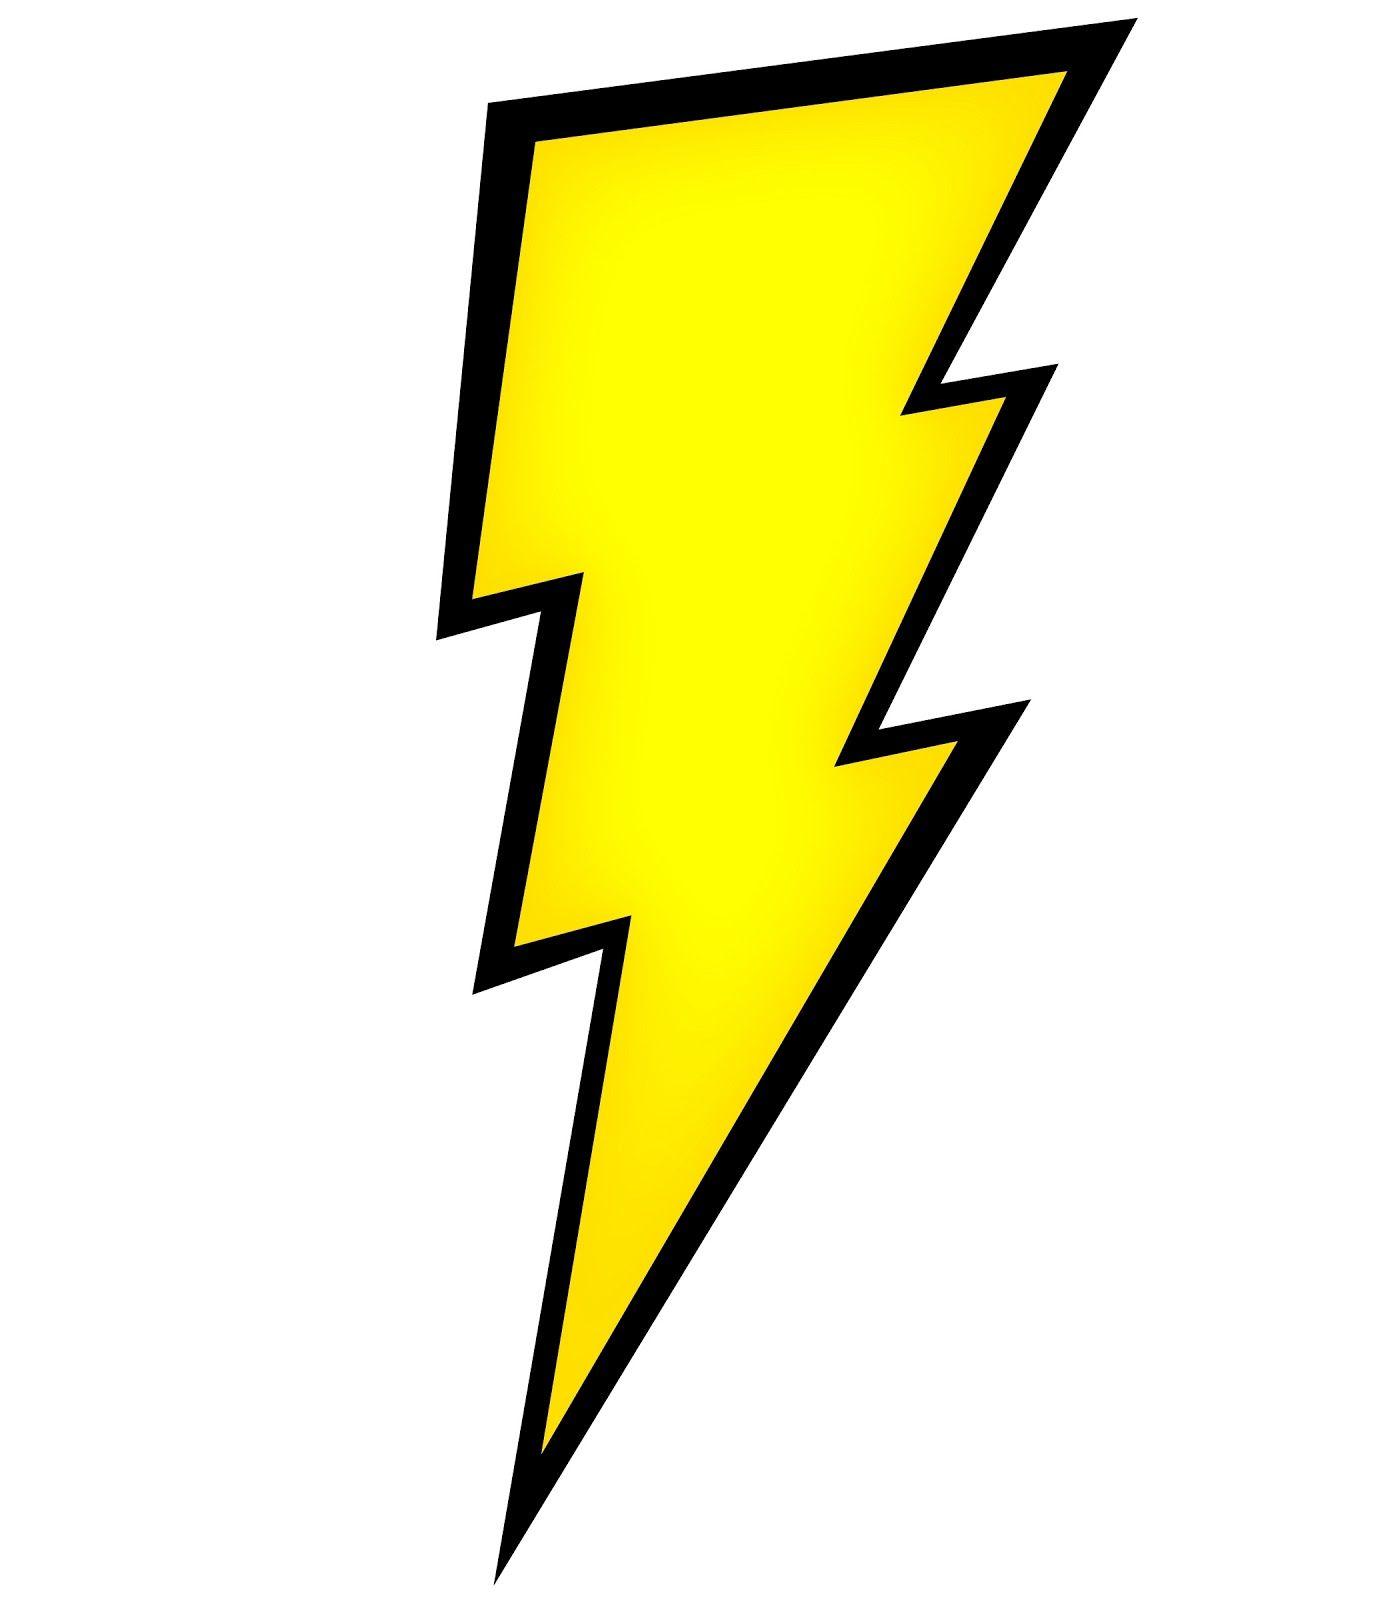 Free bolt images clipartfest. Electric clipart lightning flash